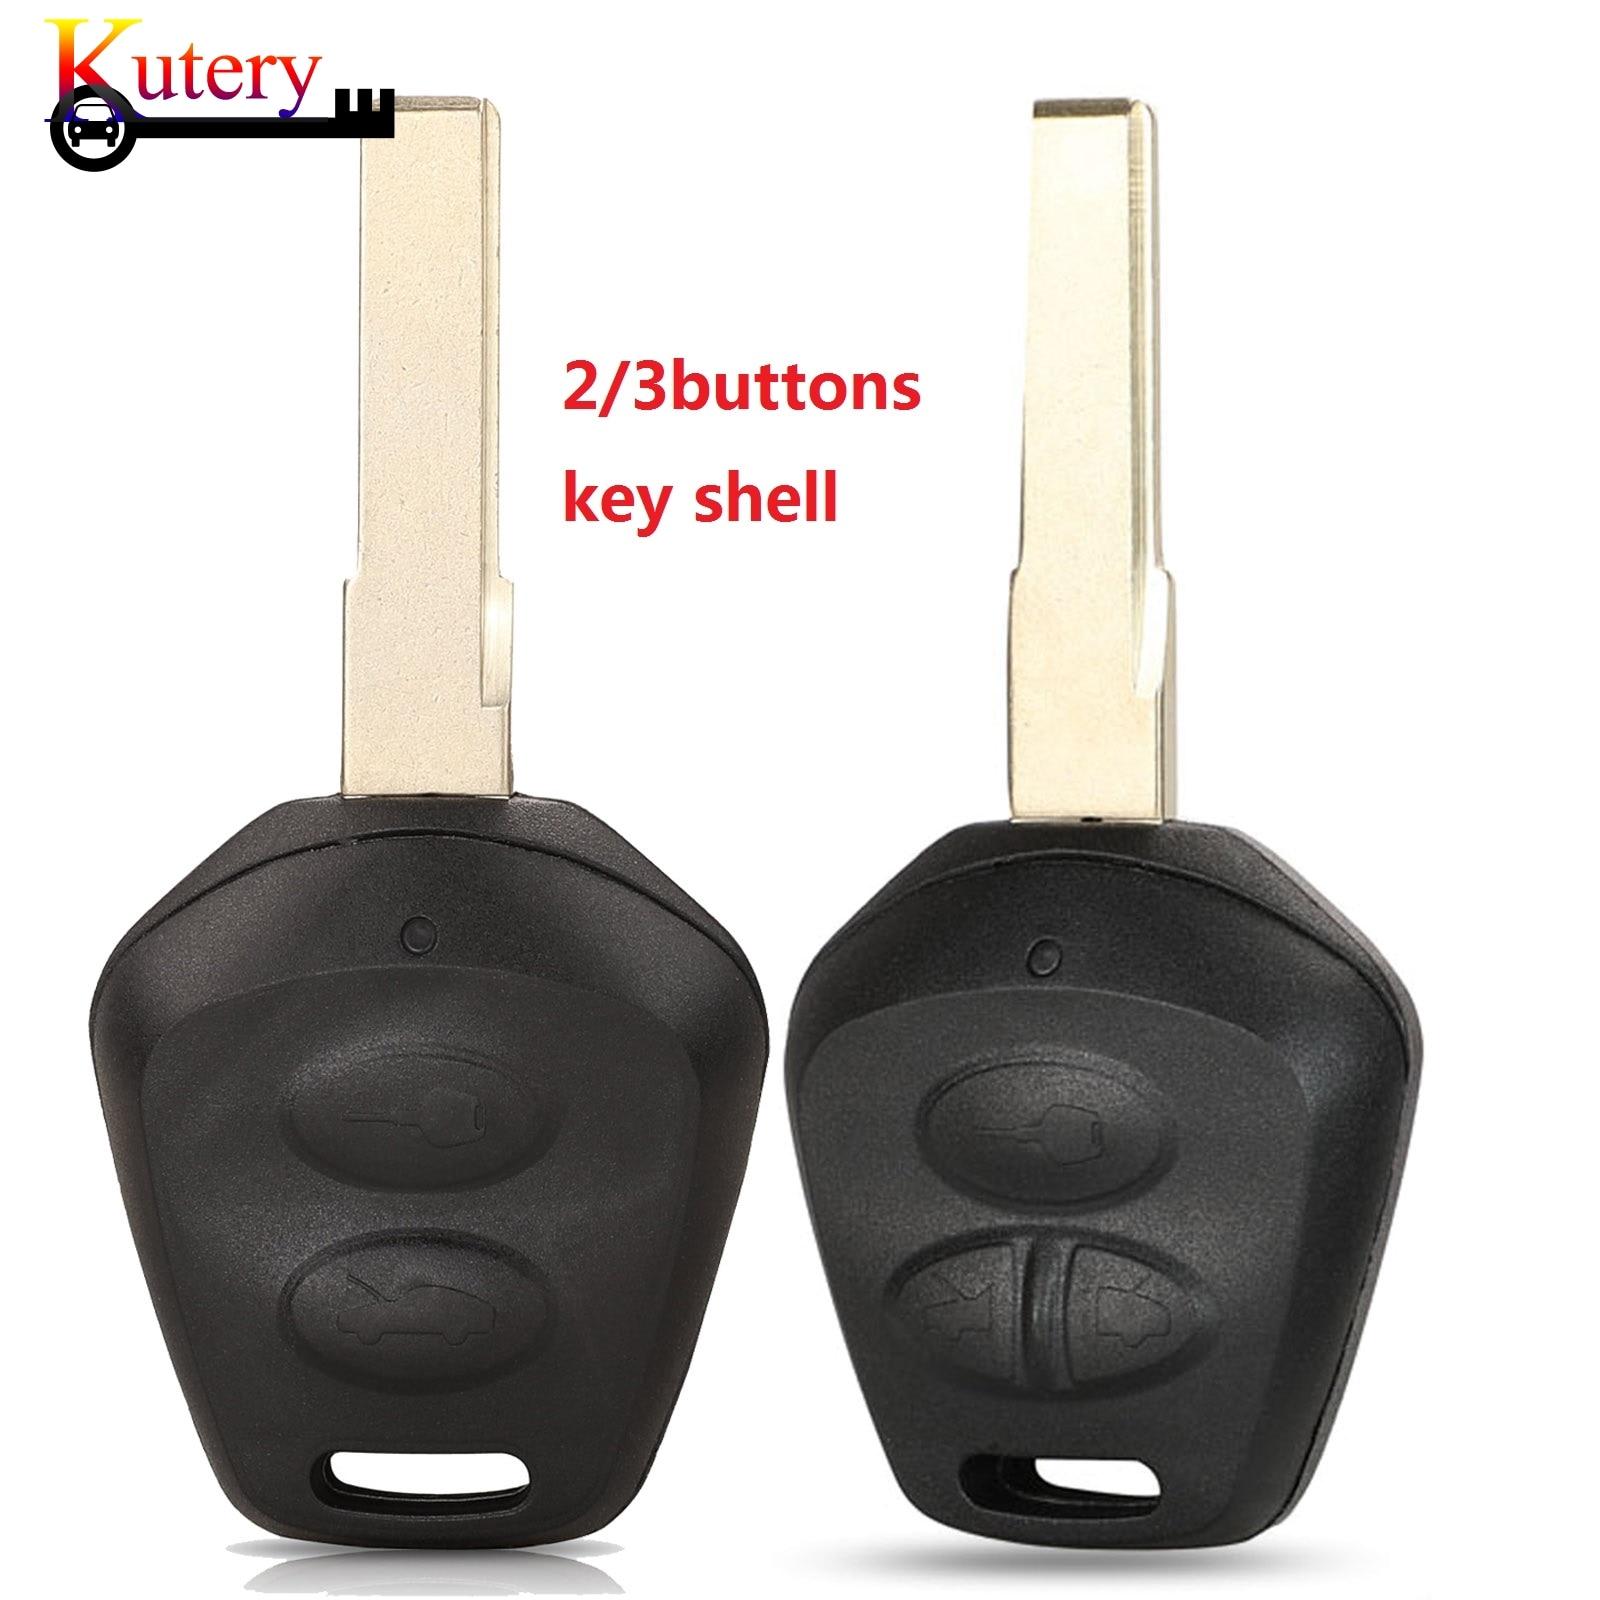 Kutery, carcasa de la llave a distancia con 2/3 botones, llavero de ajuste para Porsche Box-ster S 986 911 996 con cuchilla